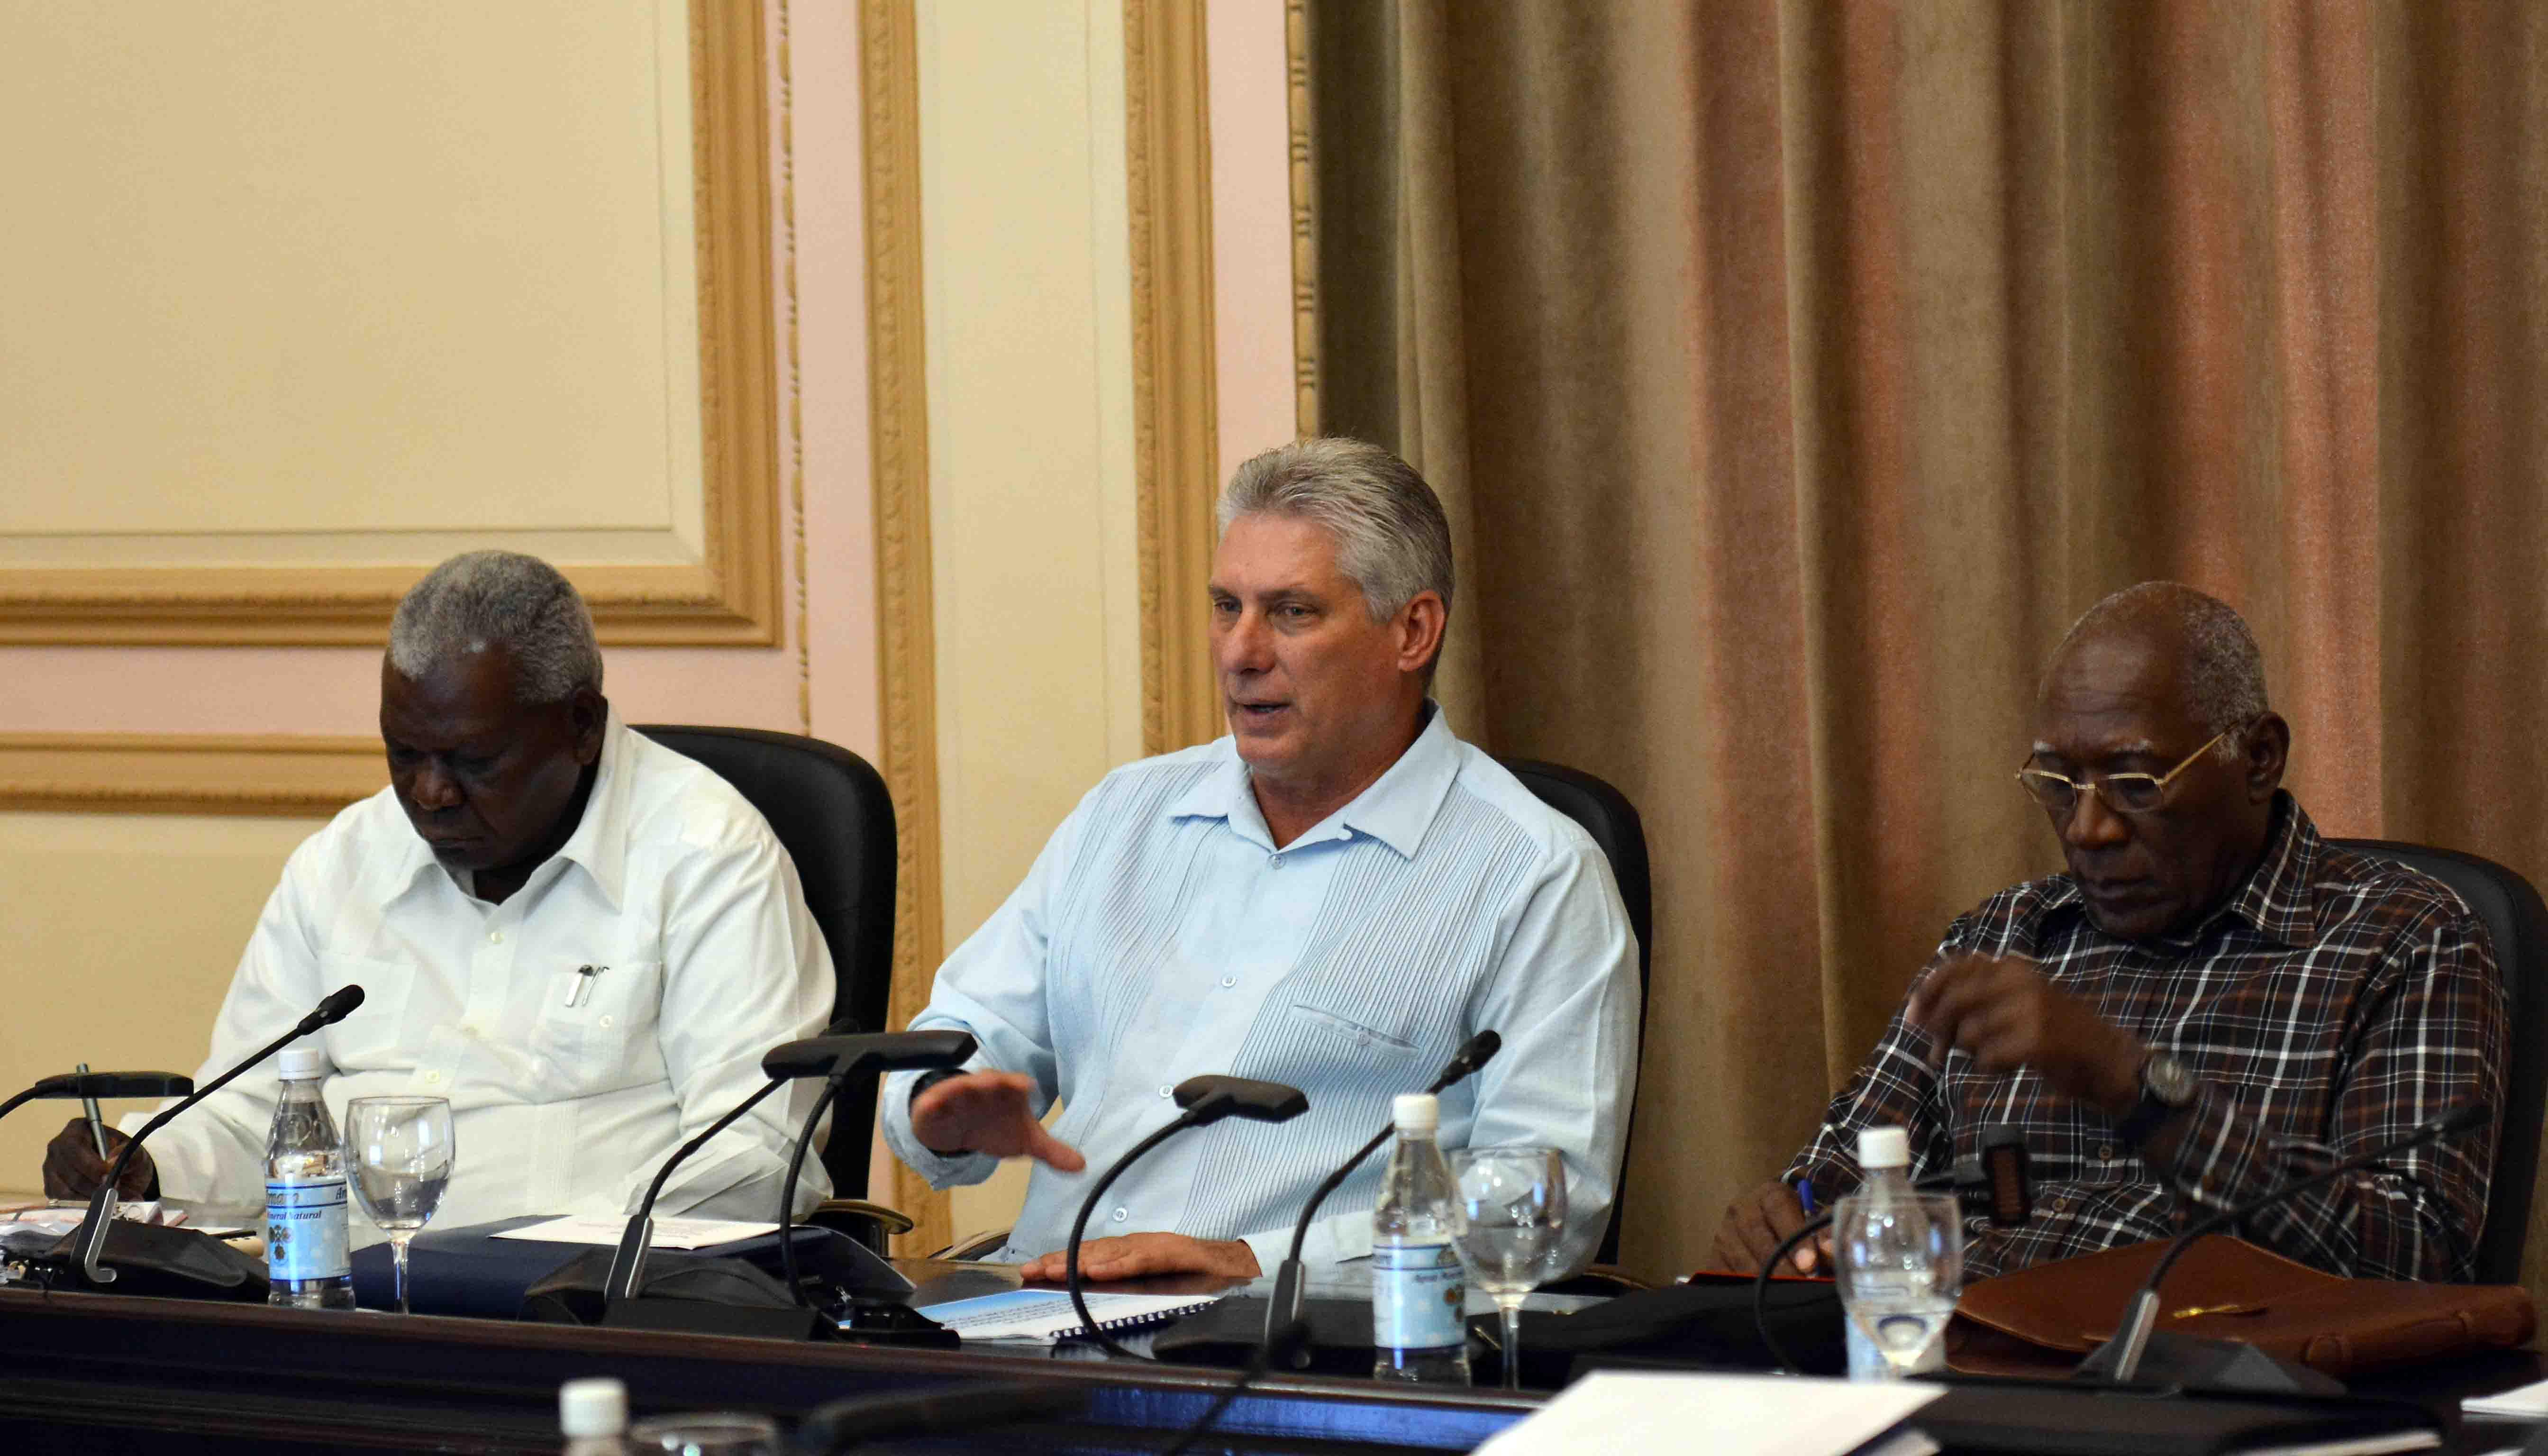 <Article>Presidente cubano reitera llamado a luchar contra corrupción</Article>_Spanish.china.org.cn_中国最权威的西班牙语新闻网站